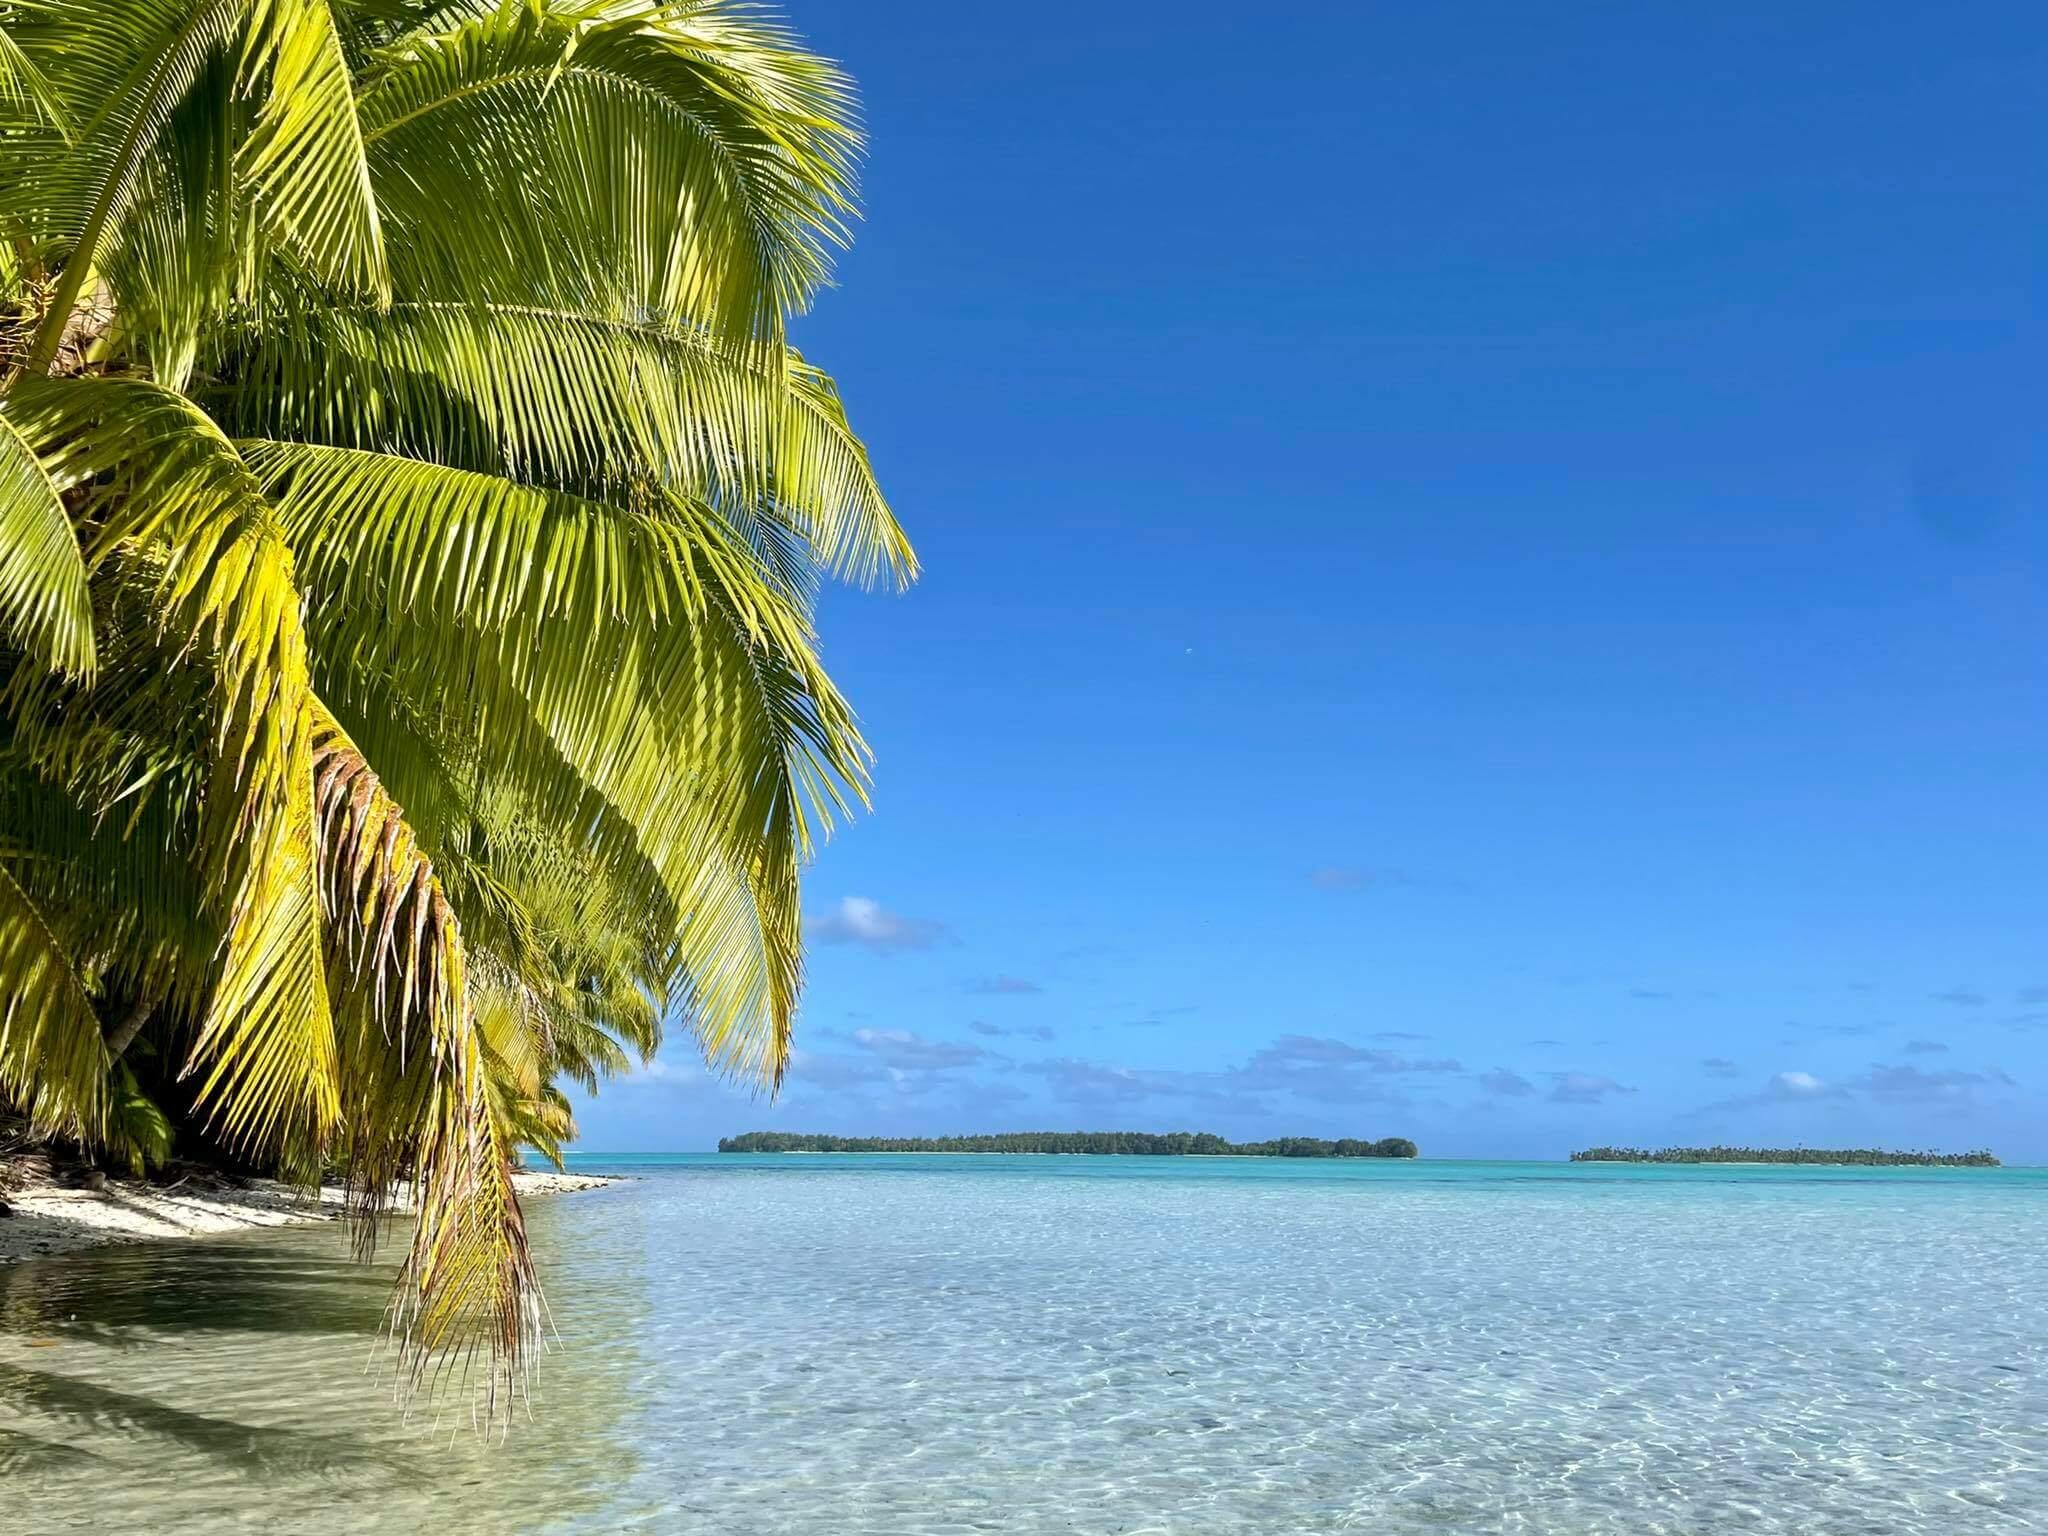 http://tahitivoileetlagon.com/wp-content/uploads/2021/07/beautiful-TETIAROA.jpg